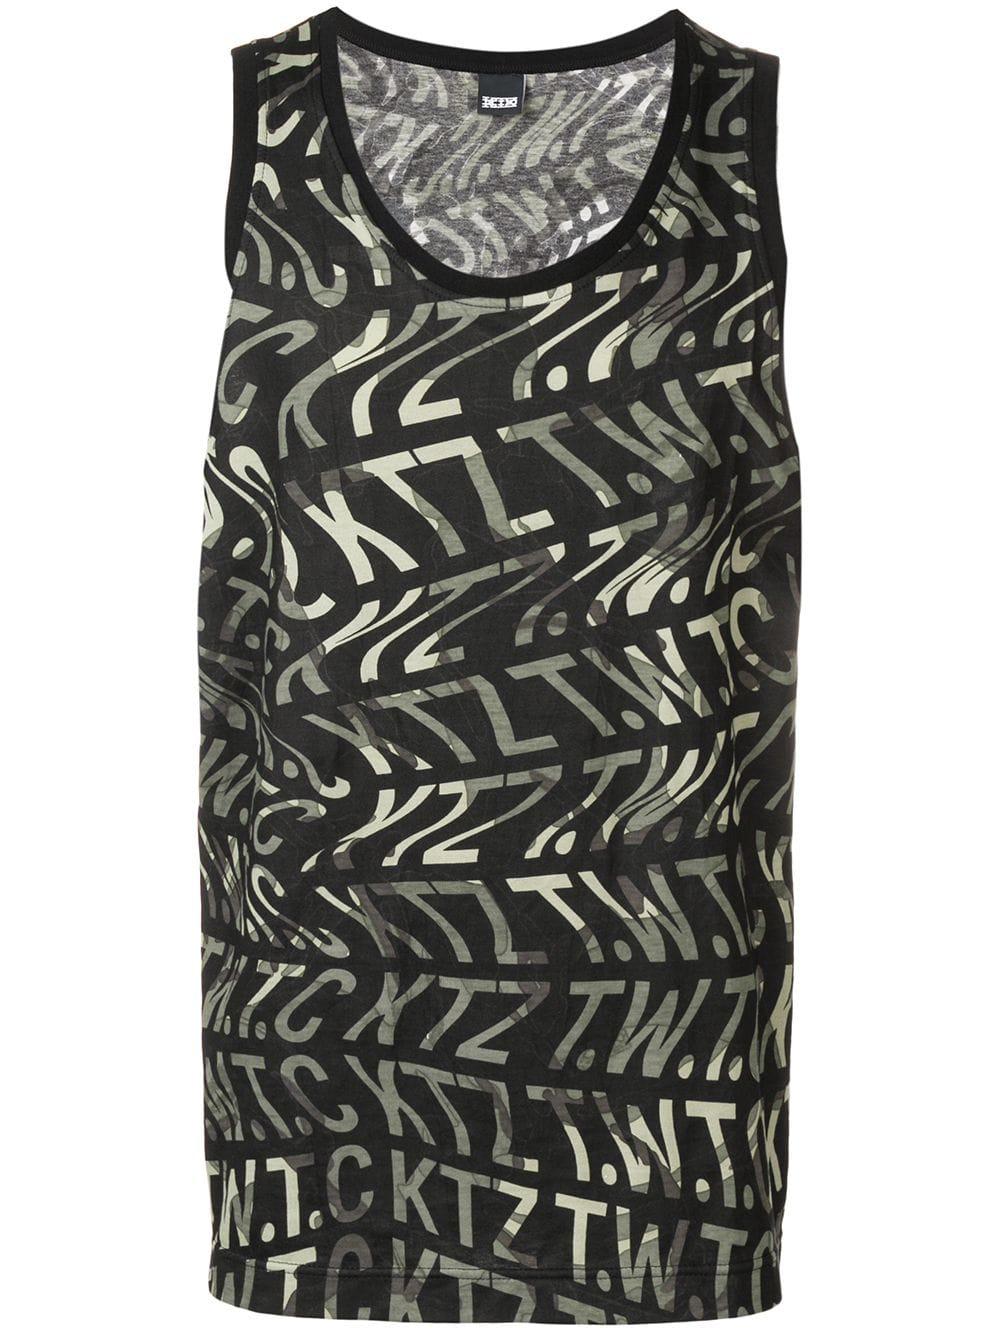 Ktz Camo Vest With Ripple - Black